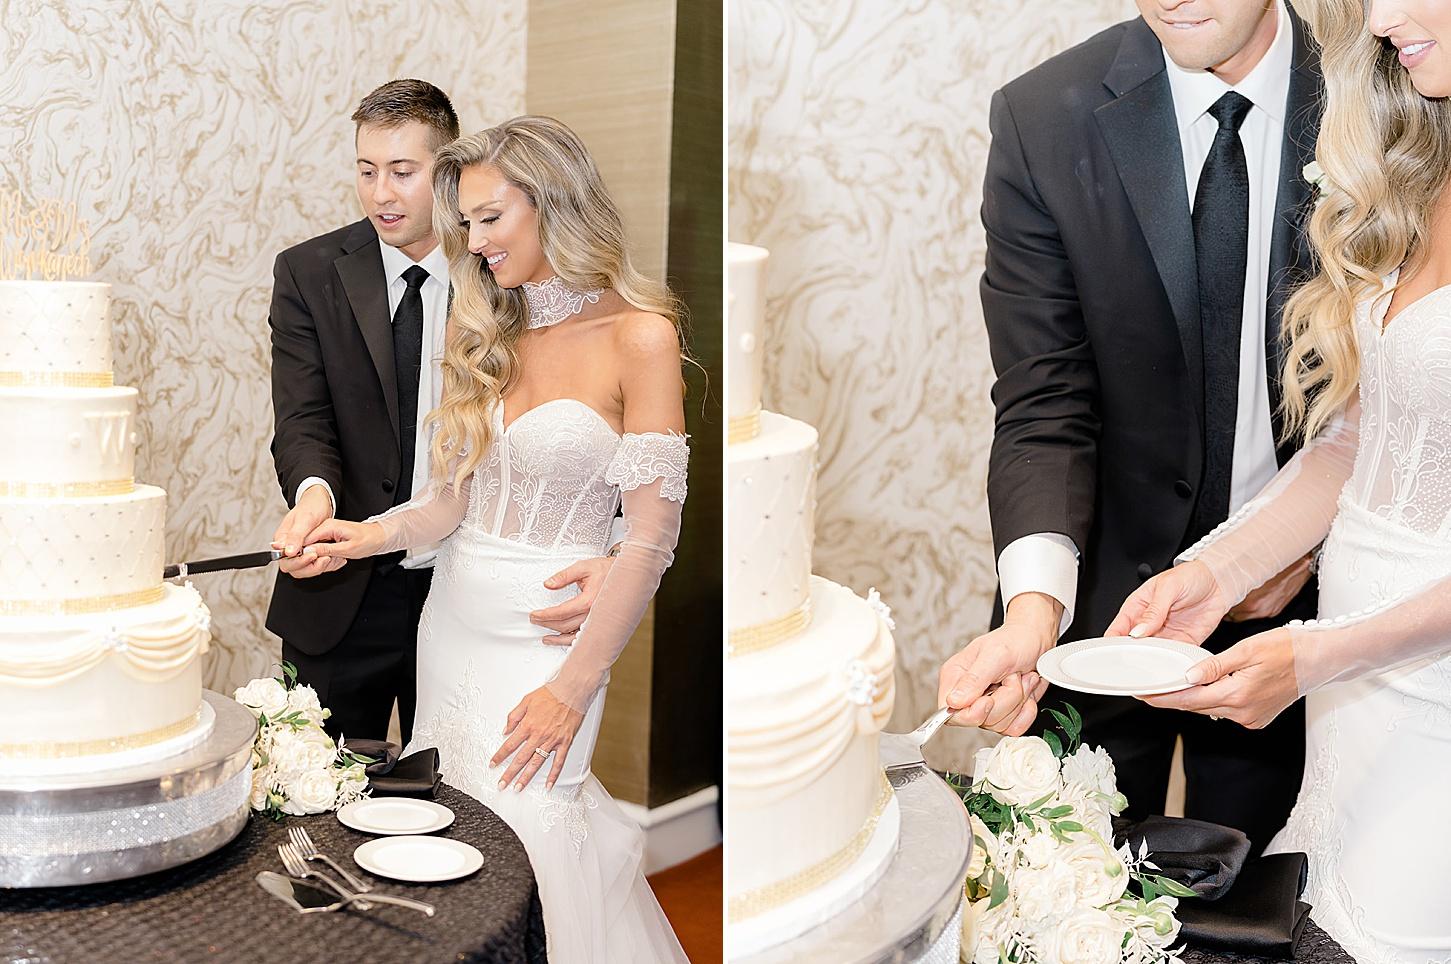 Atlantic City Wedding Photography Studio by Magdalena Studios Lexy Cha 0092